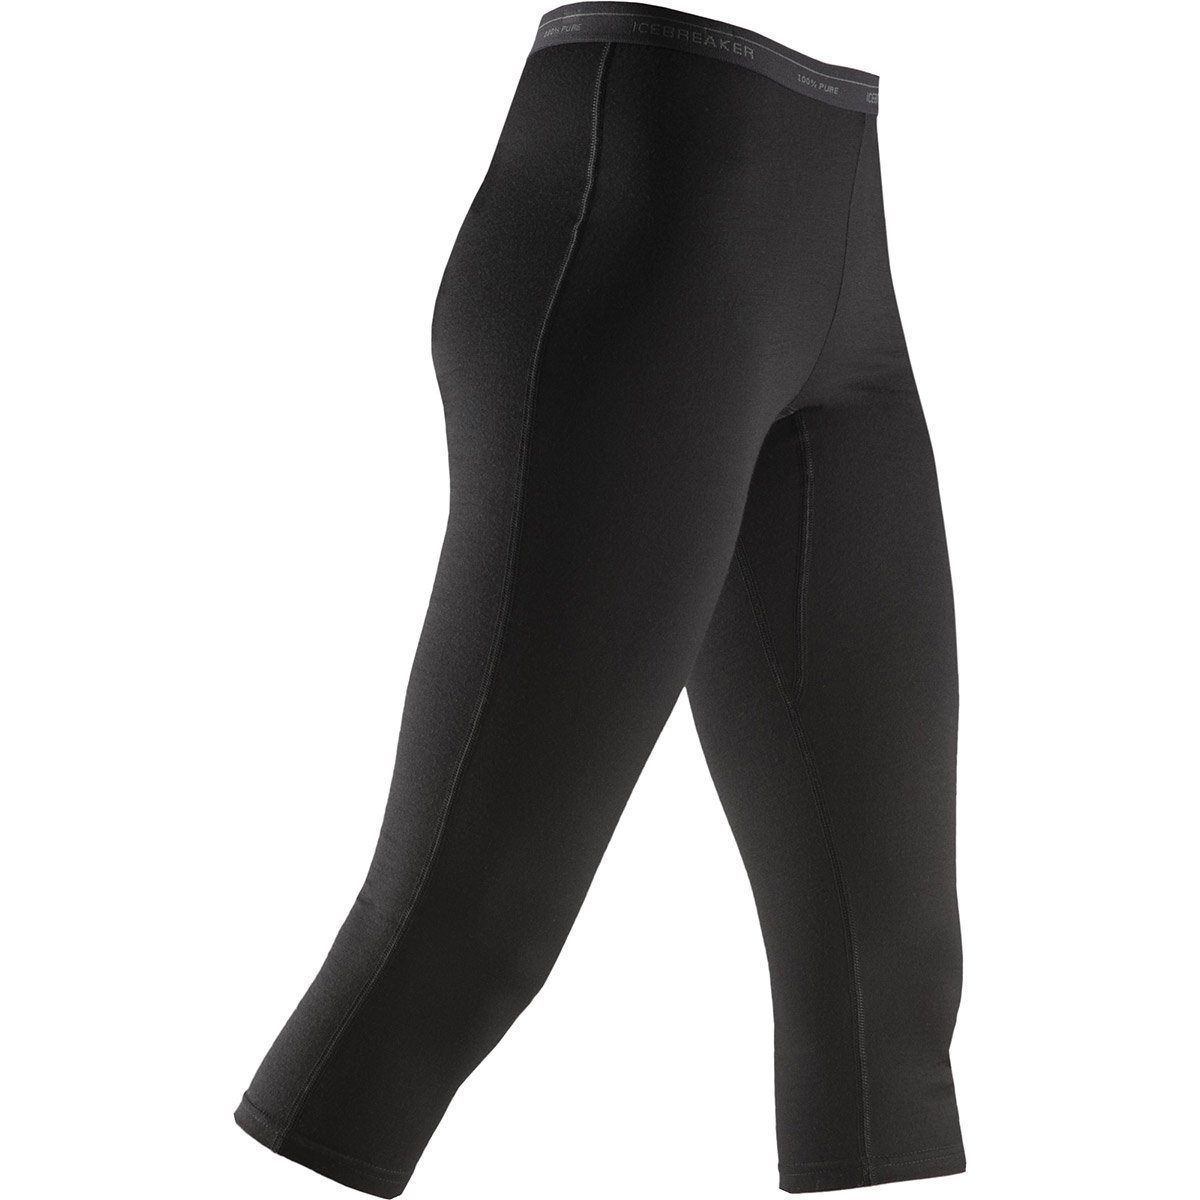 Icebreaker Damen Unterhose Leggings Oasis Legless